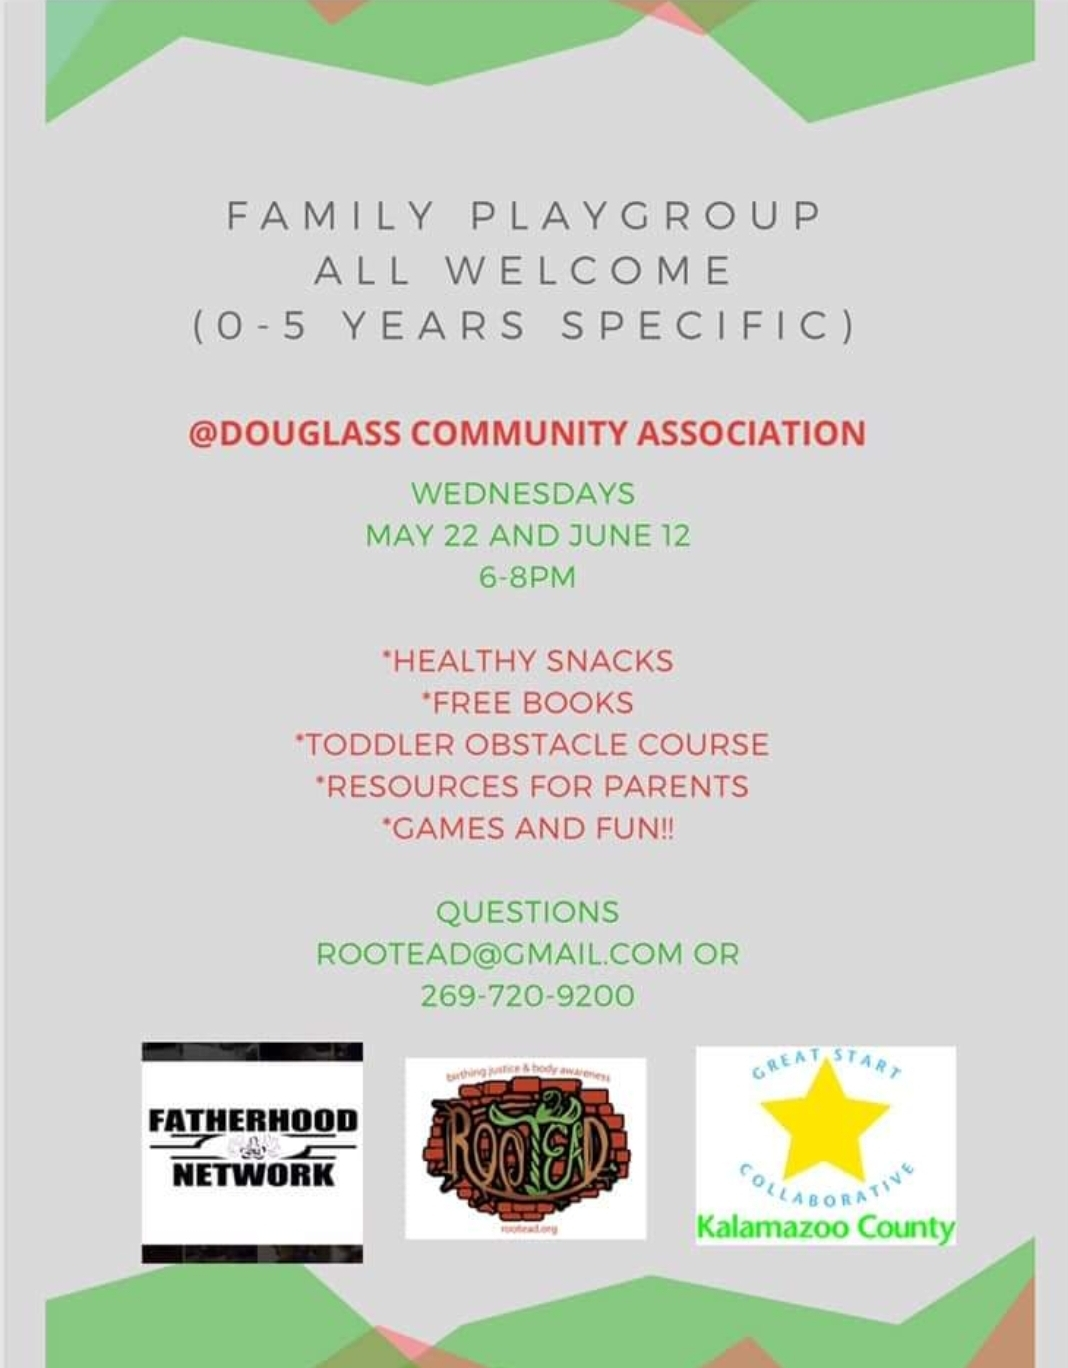 playgroup at douglass